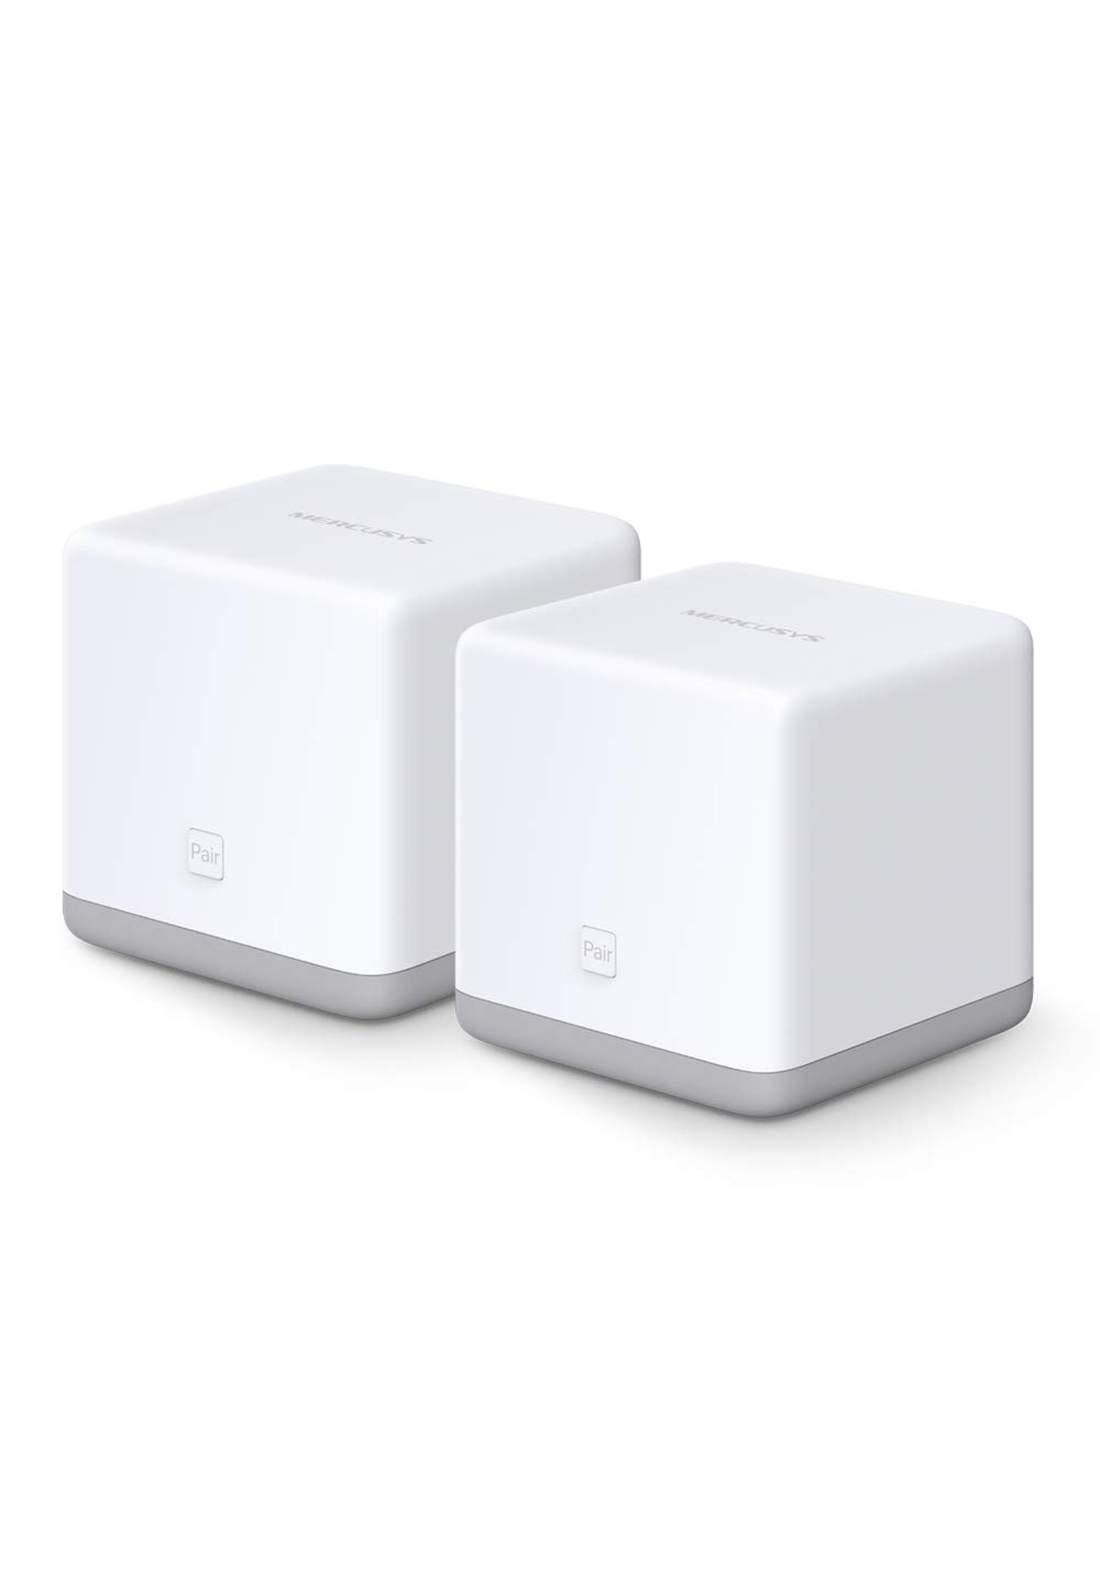 Mercusys halo-s3-2p  Router -White رواتر